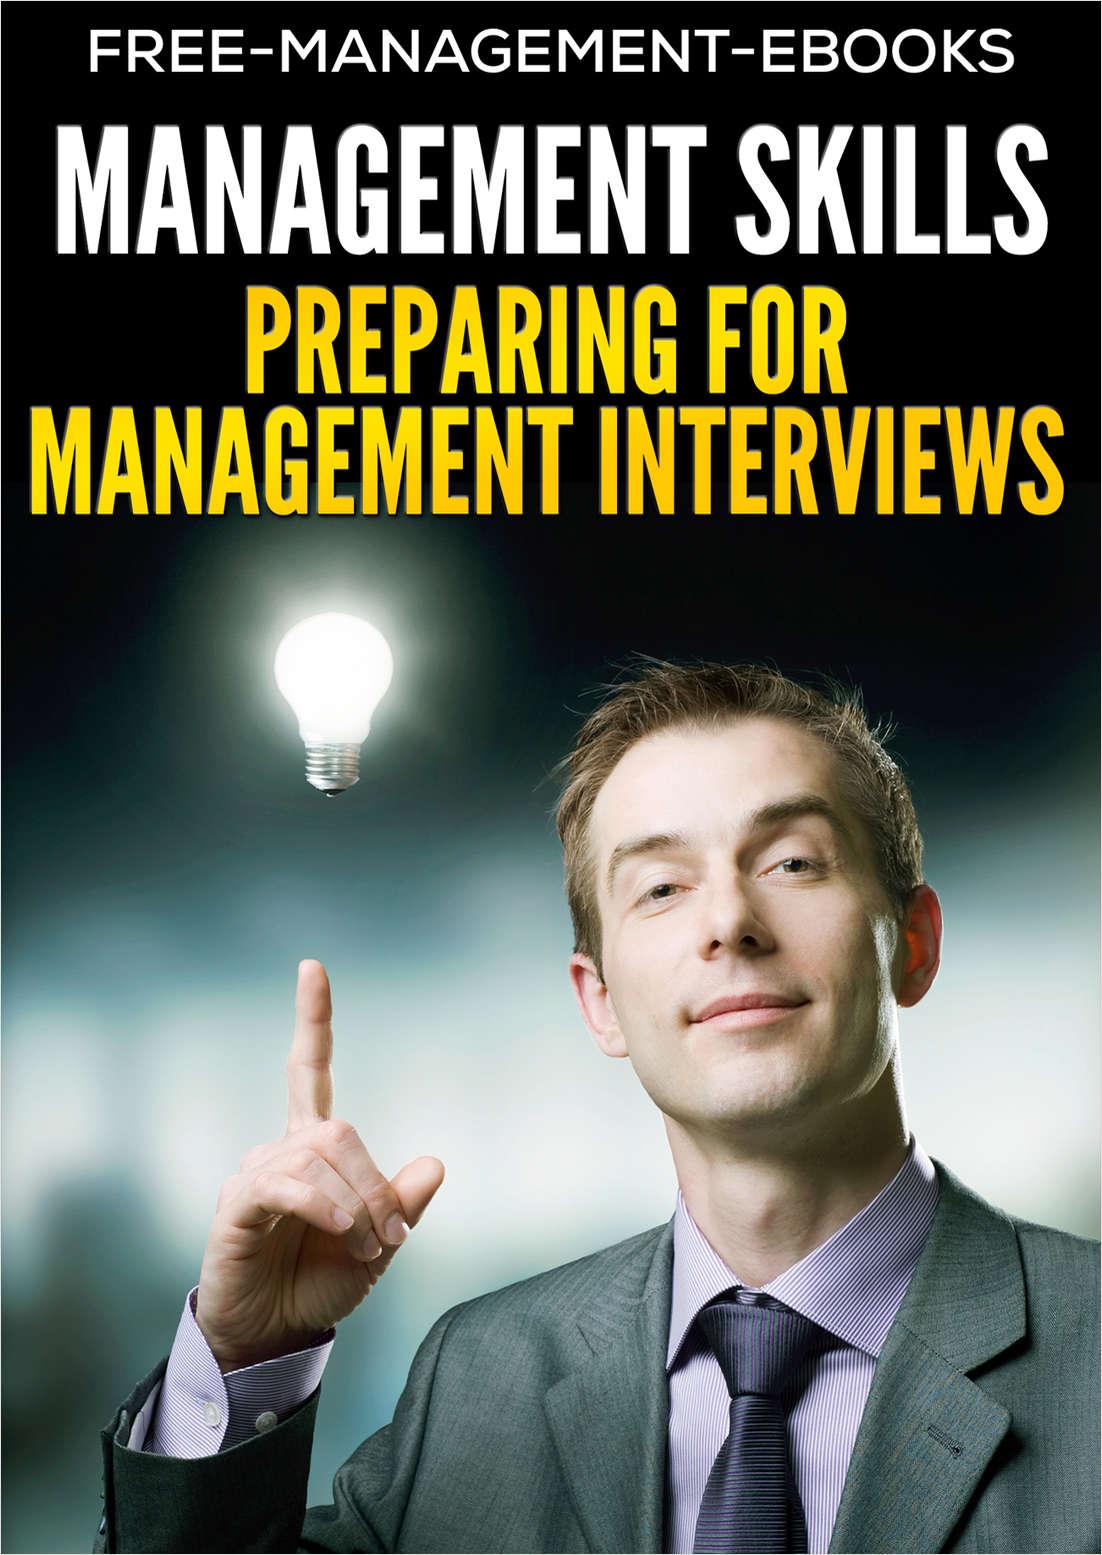 Preparing for Management Interviews - Developing Your Management Skills